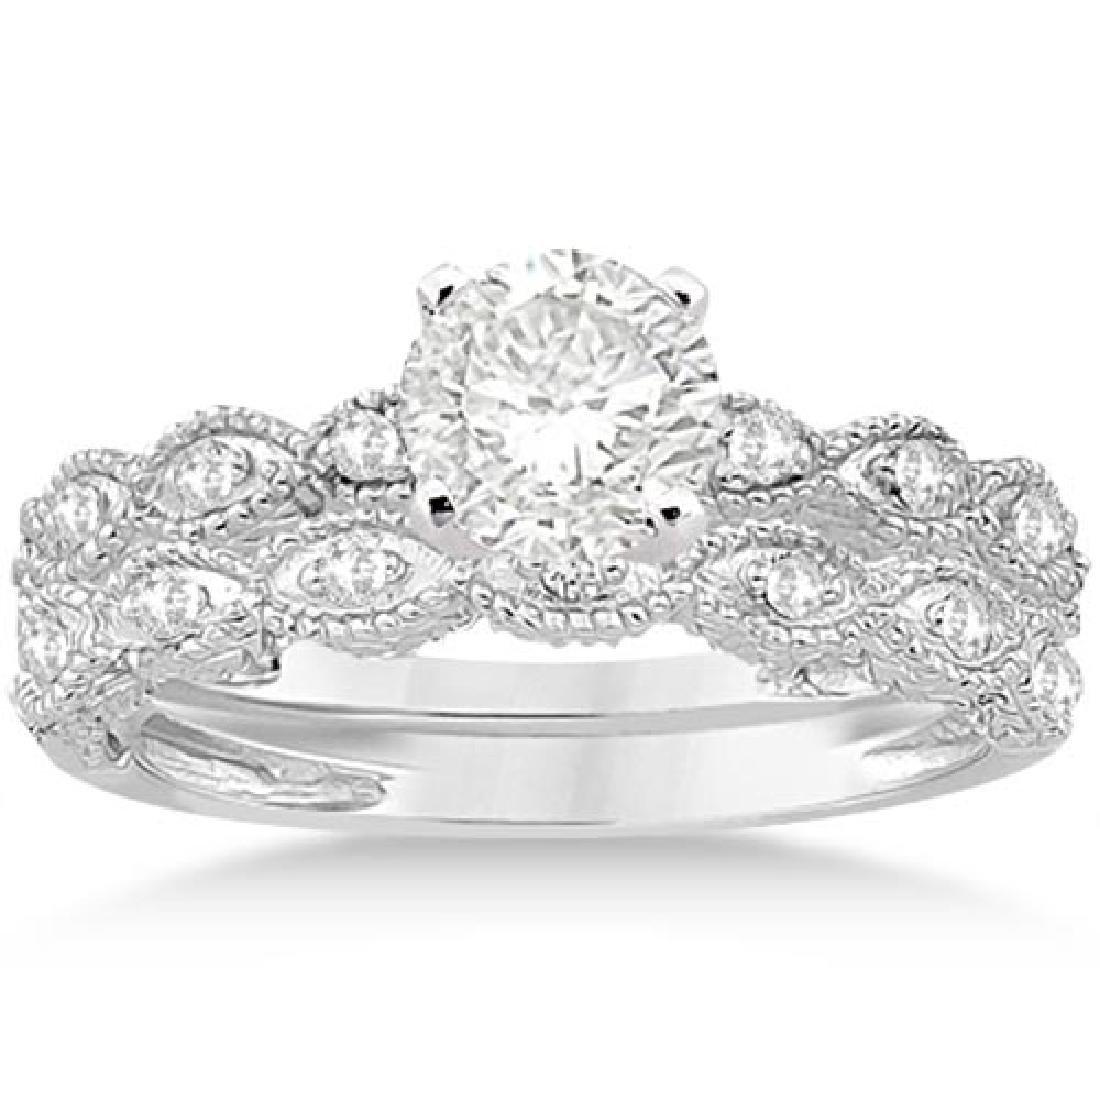 Antique Diamond Engagement Ring Set 14k White Gold 1.10